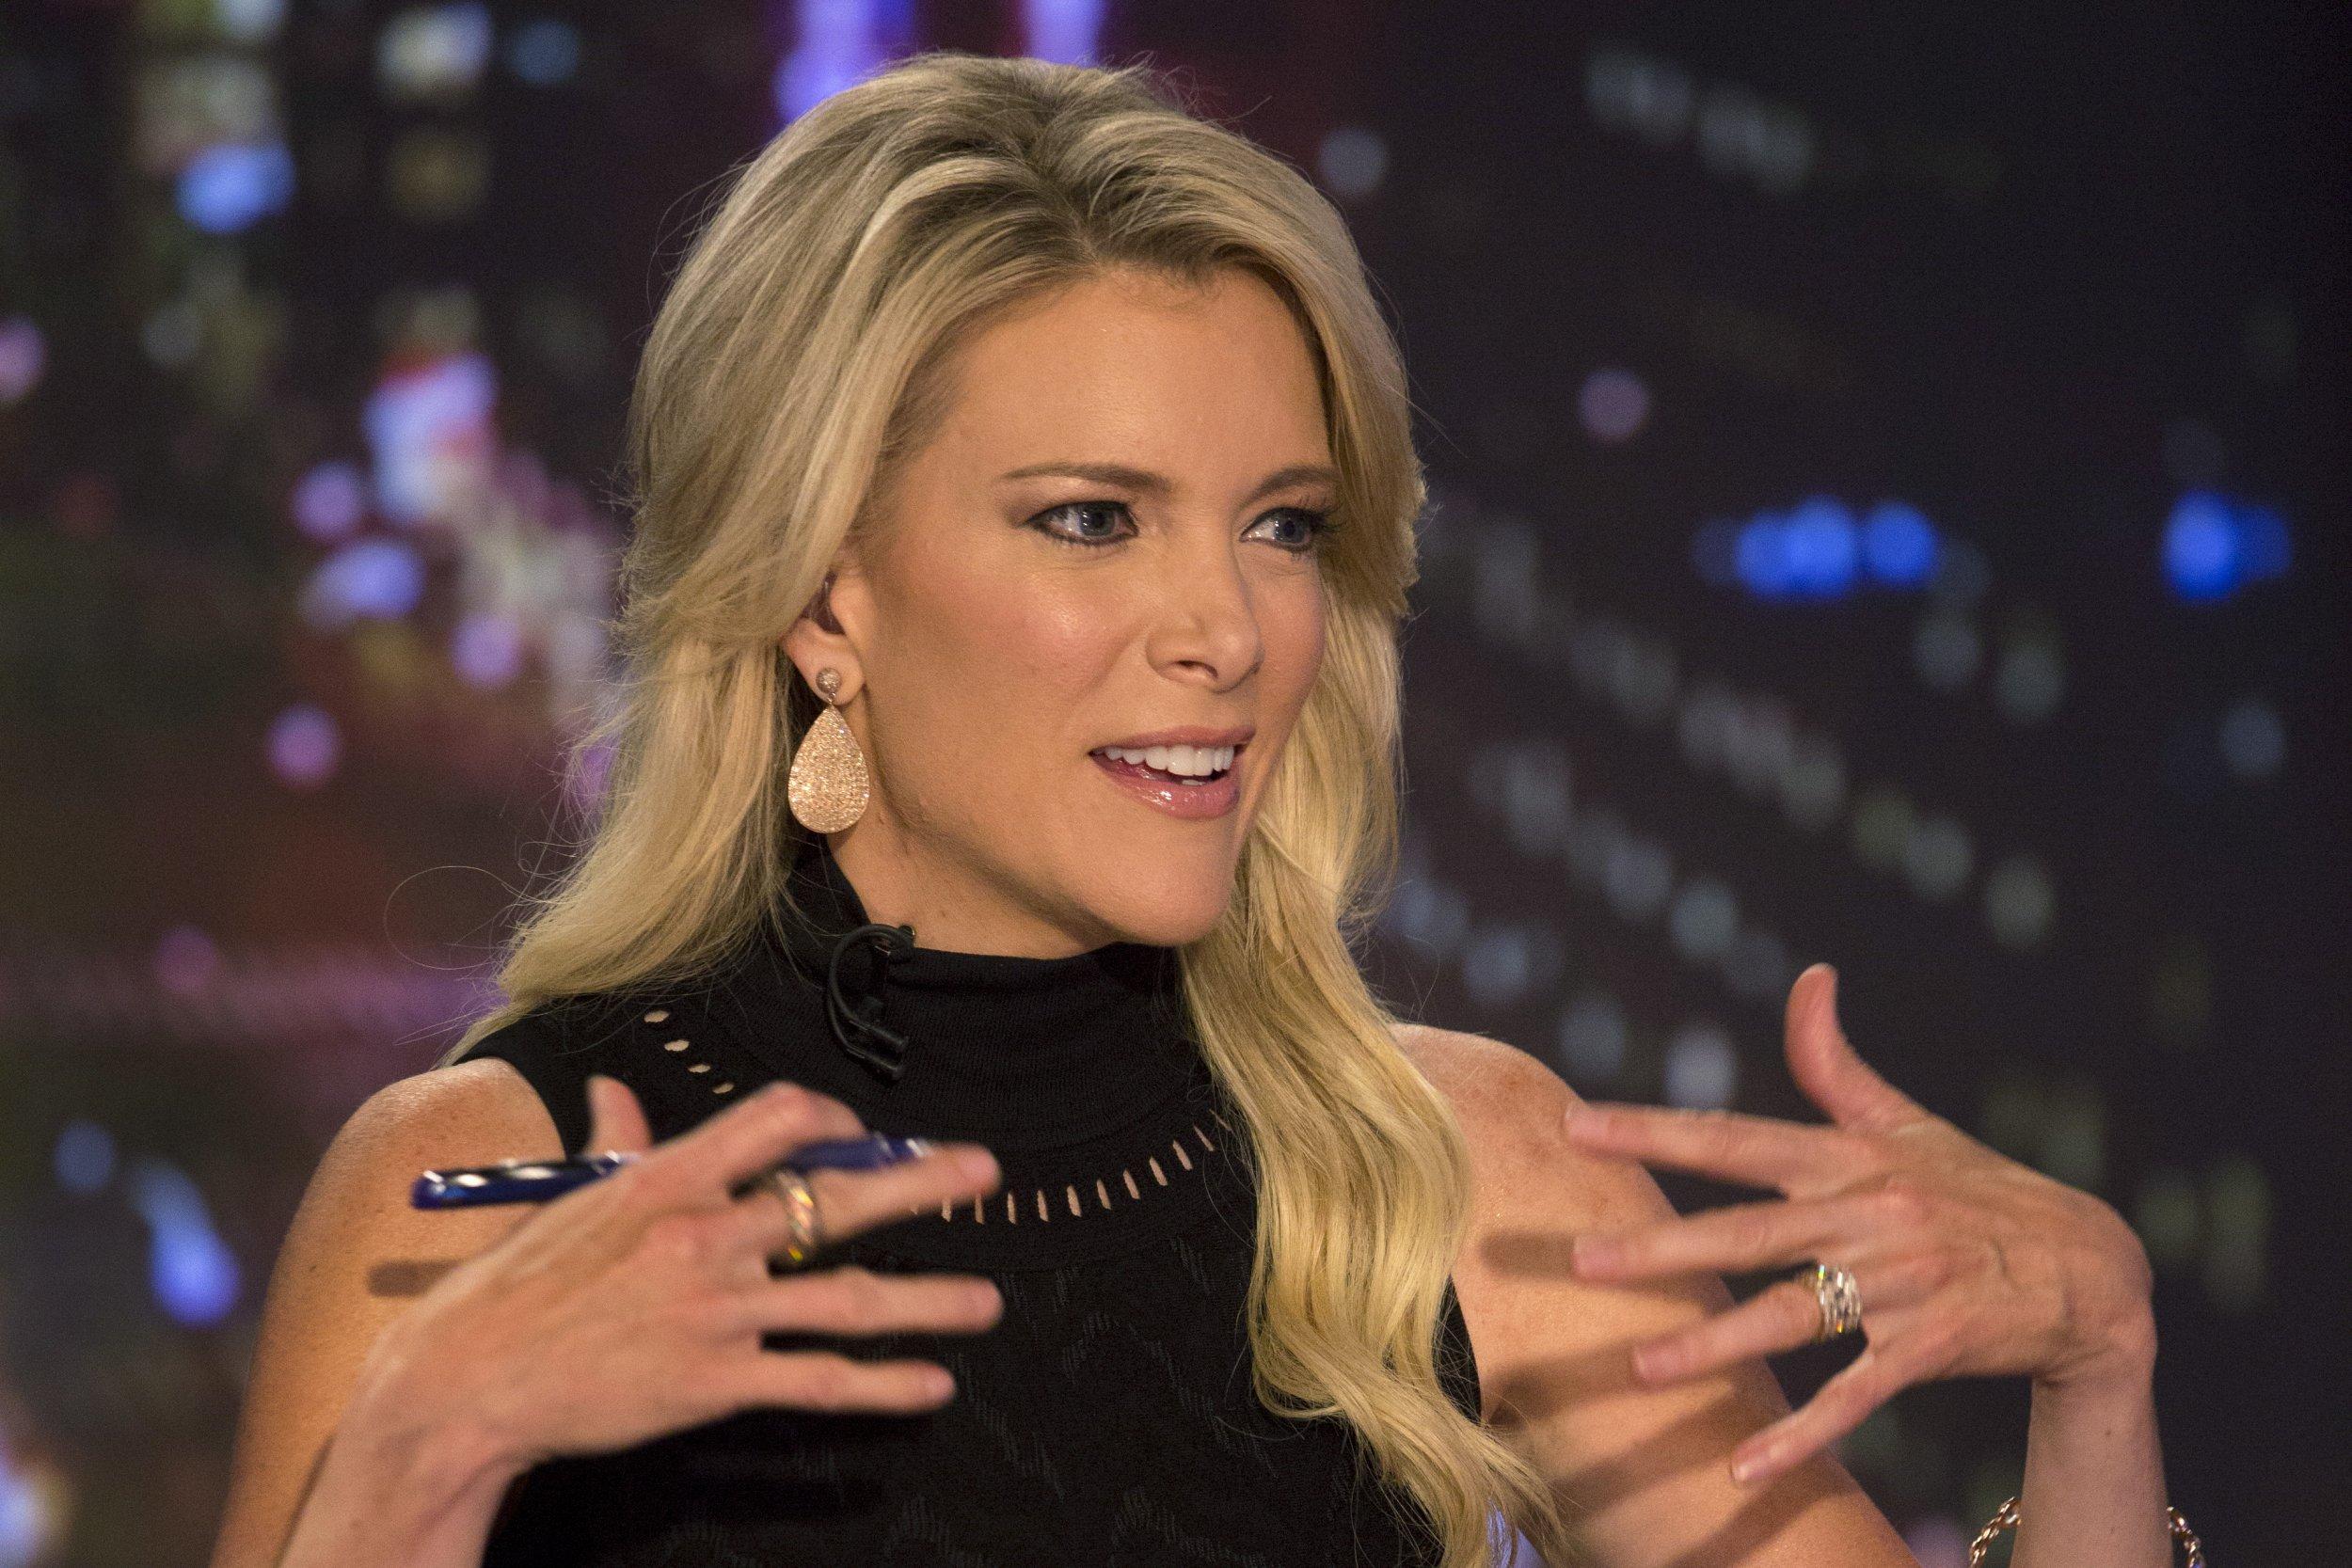 The Truth Behind Megyn Kelly's NBC Deal